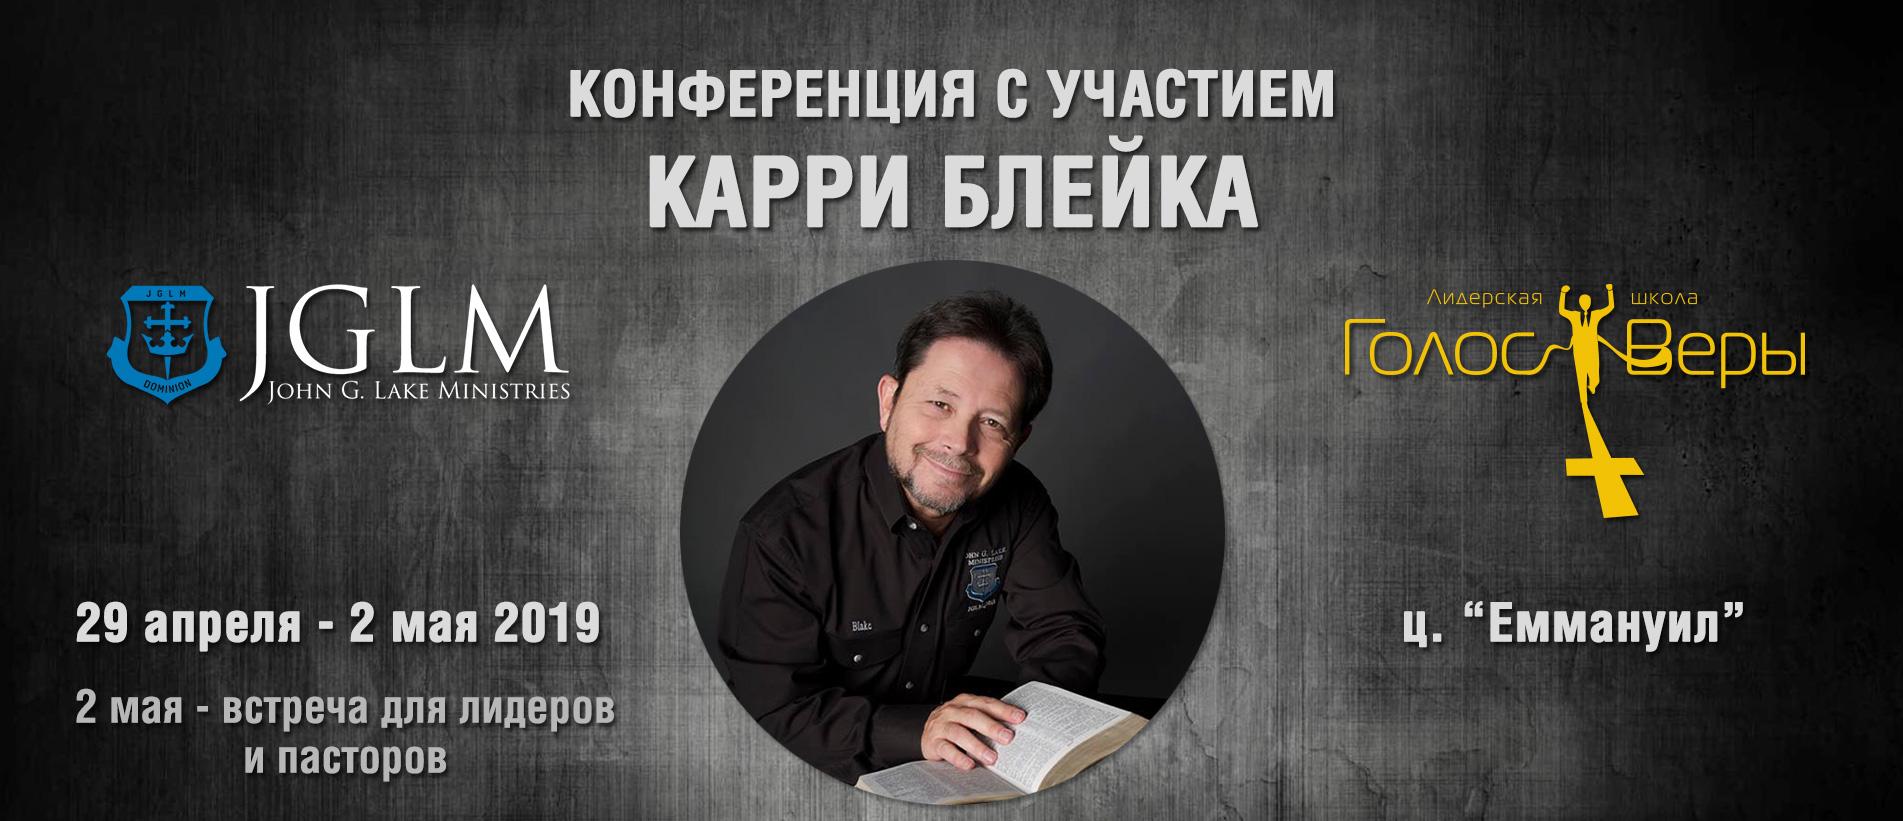 Конференция с Карри Блейком 29.04-2.05.2019